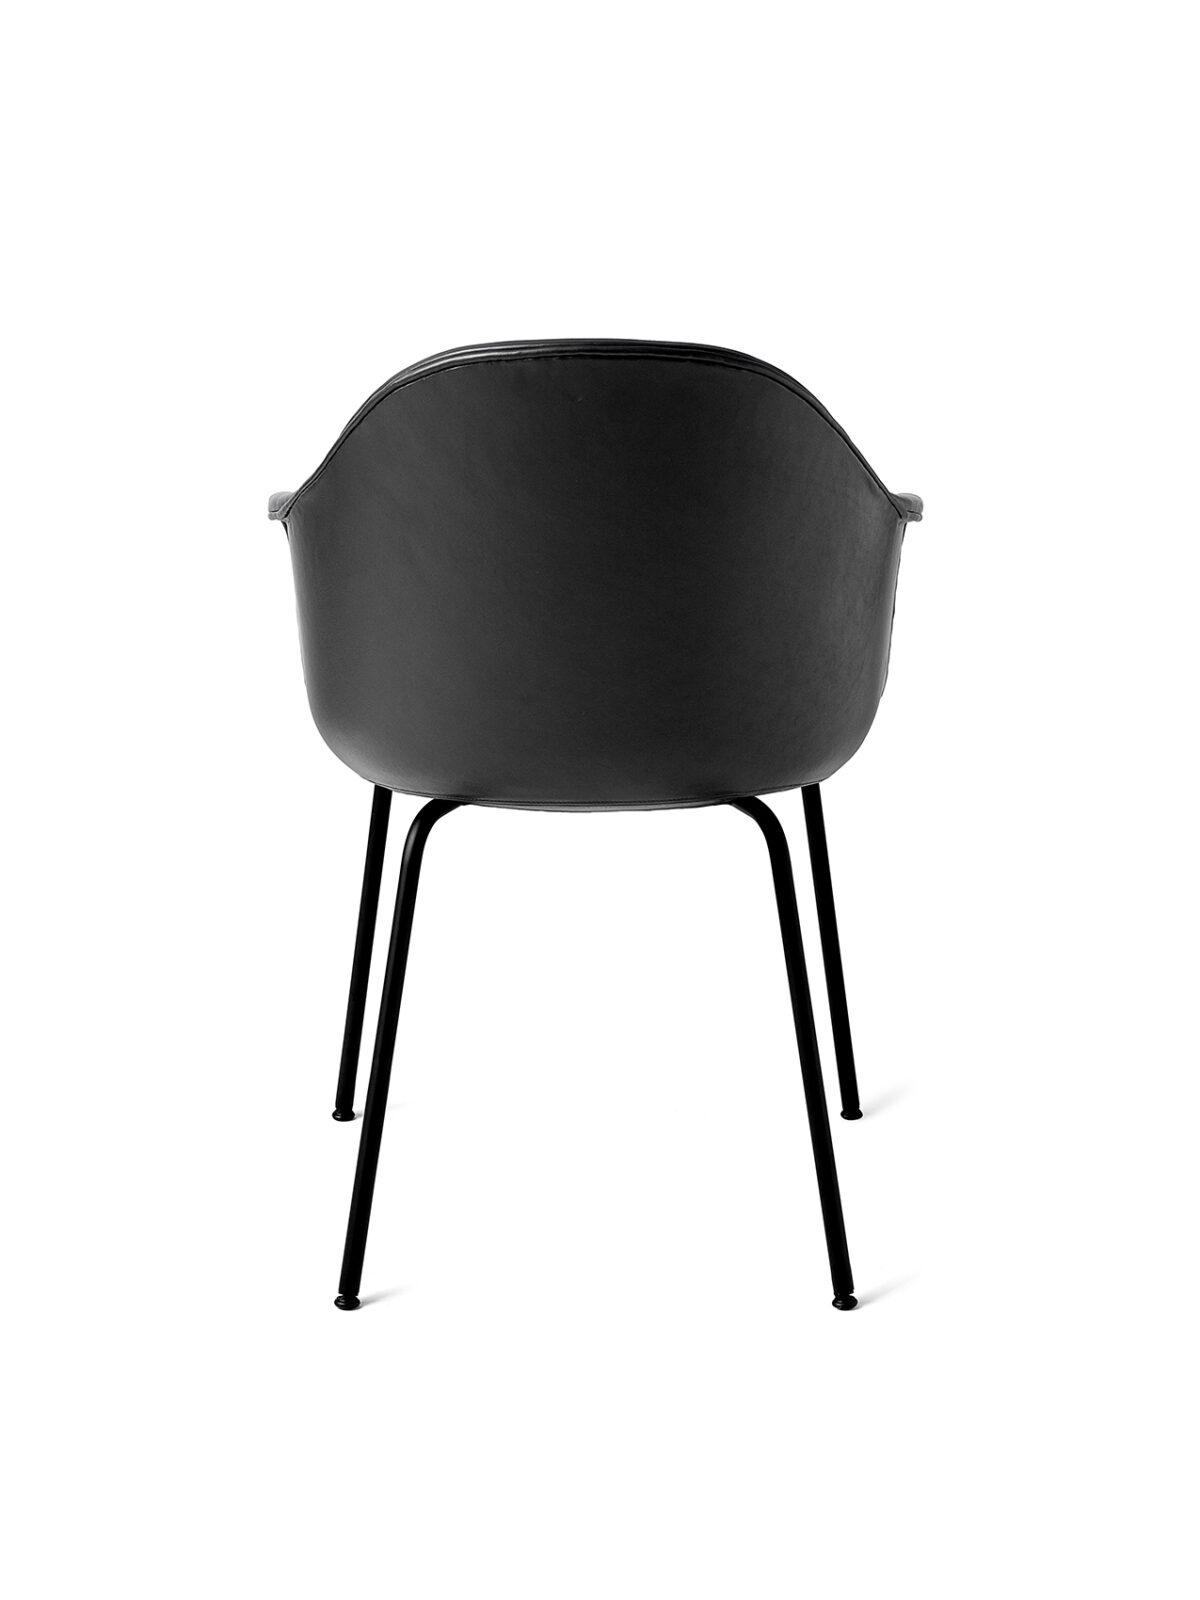 9355559 Harbour Chair DakarBlack0842 Black Back 1